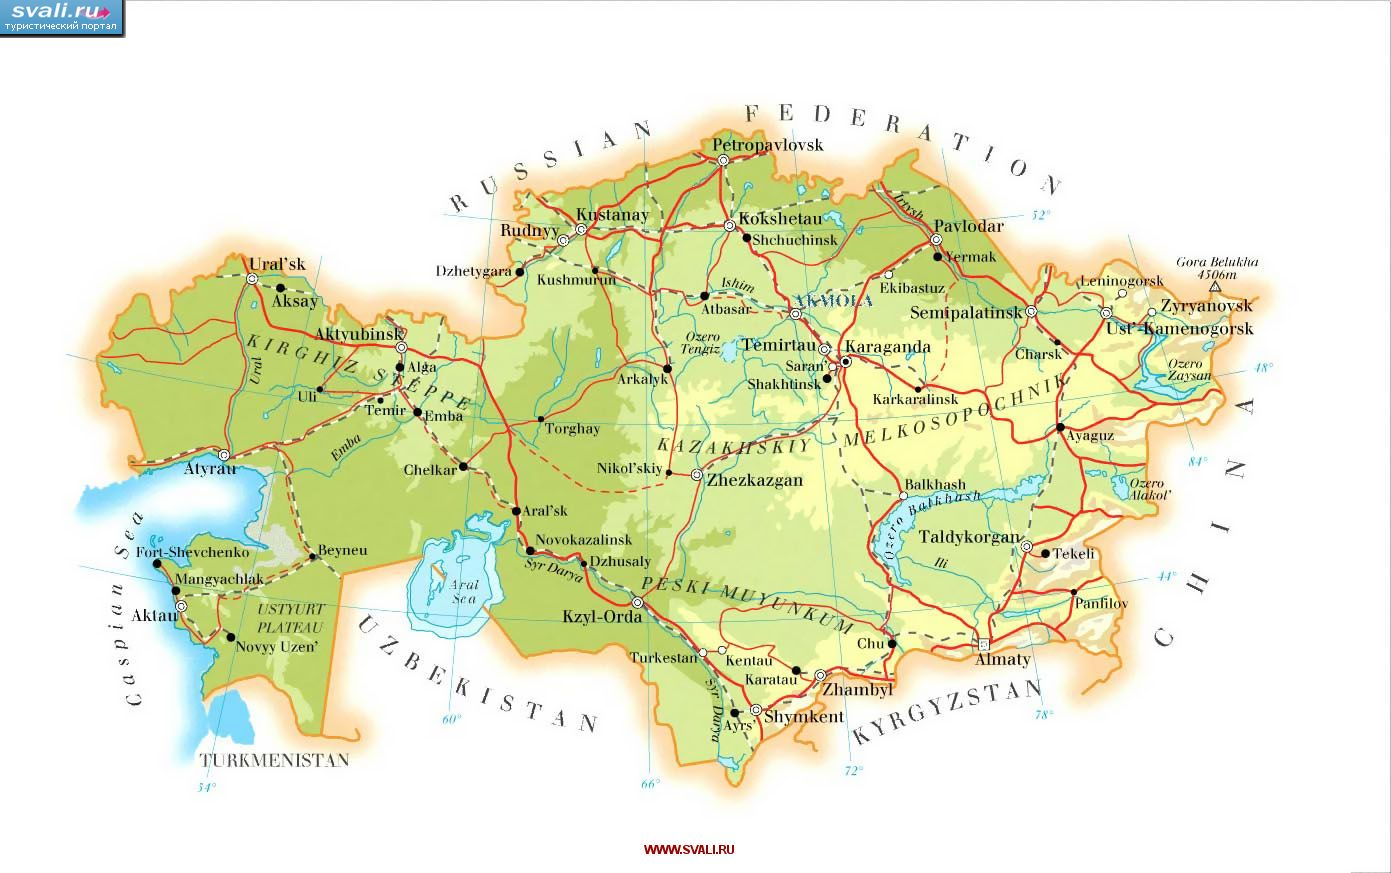 Karty Karta Kazahstana Angl Kazahstan Turisticheskij